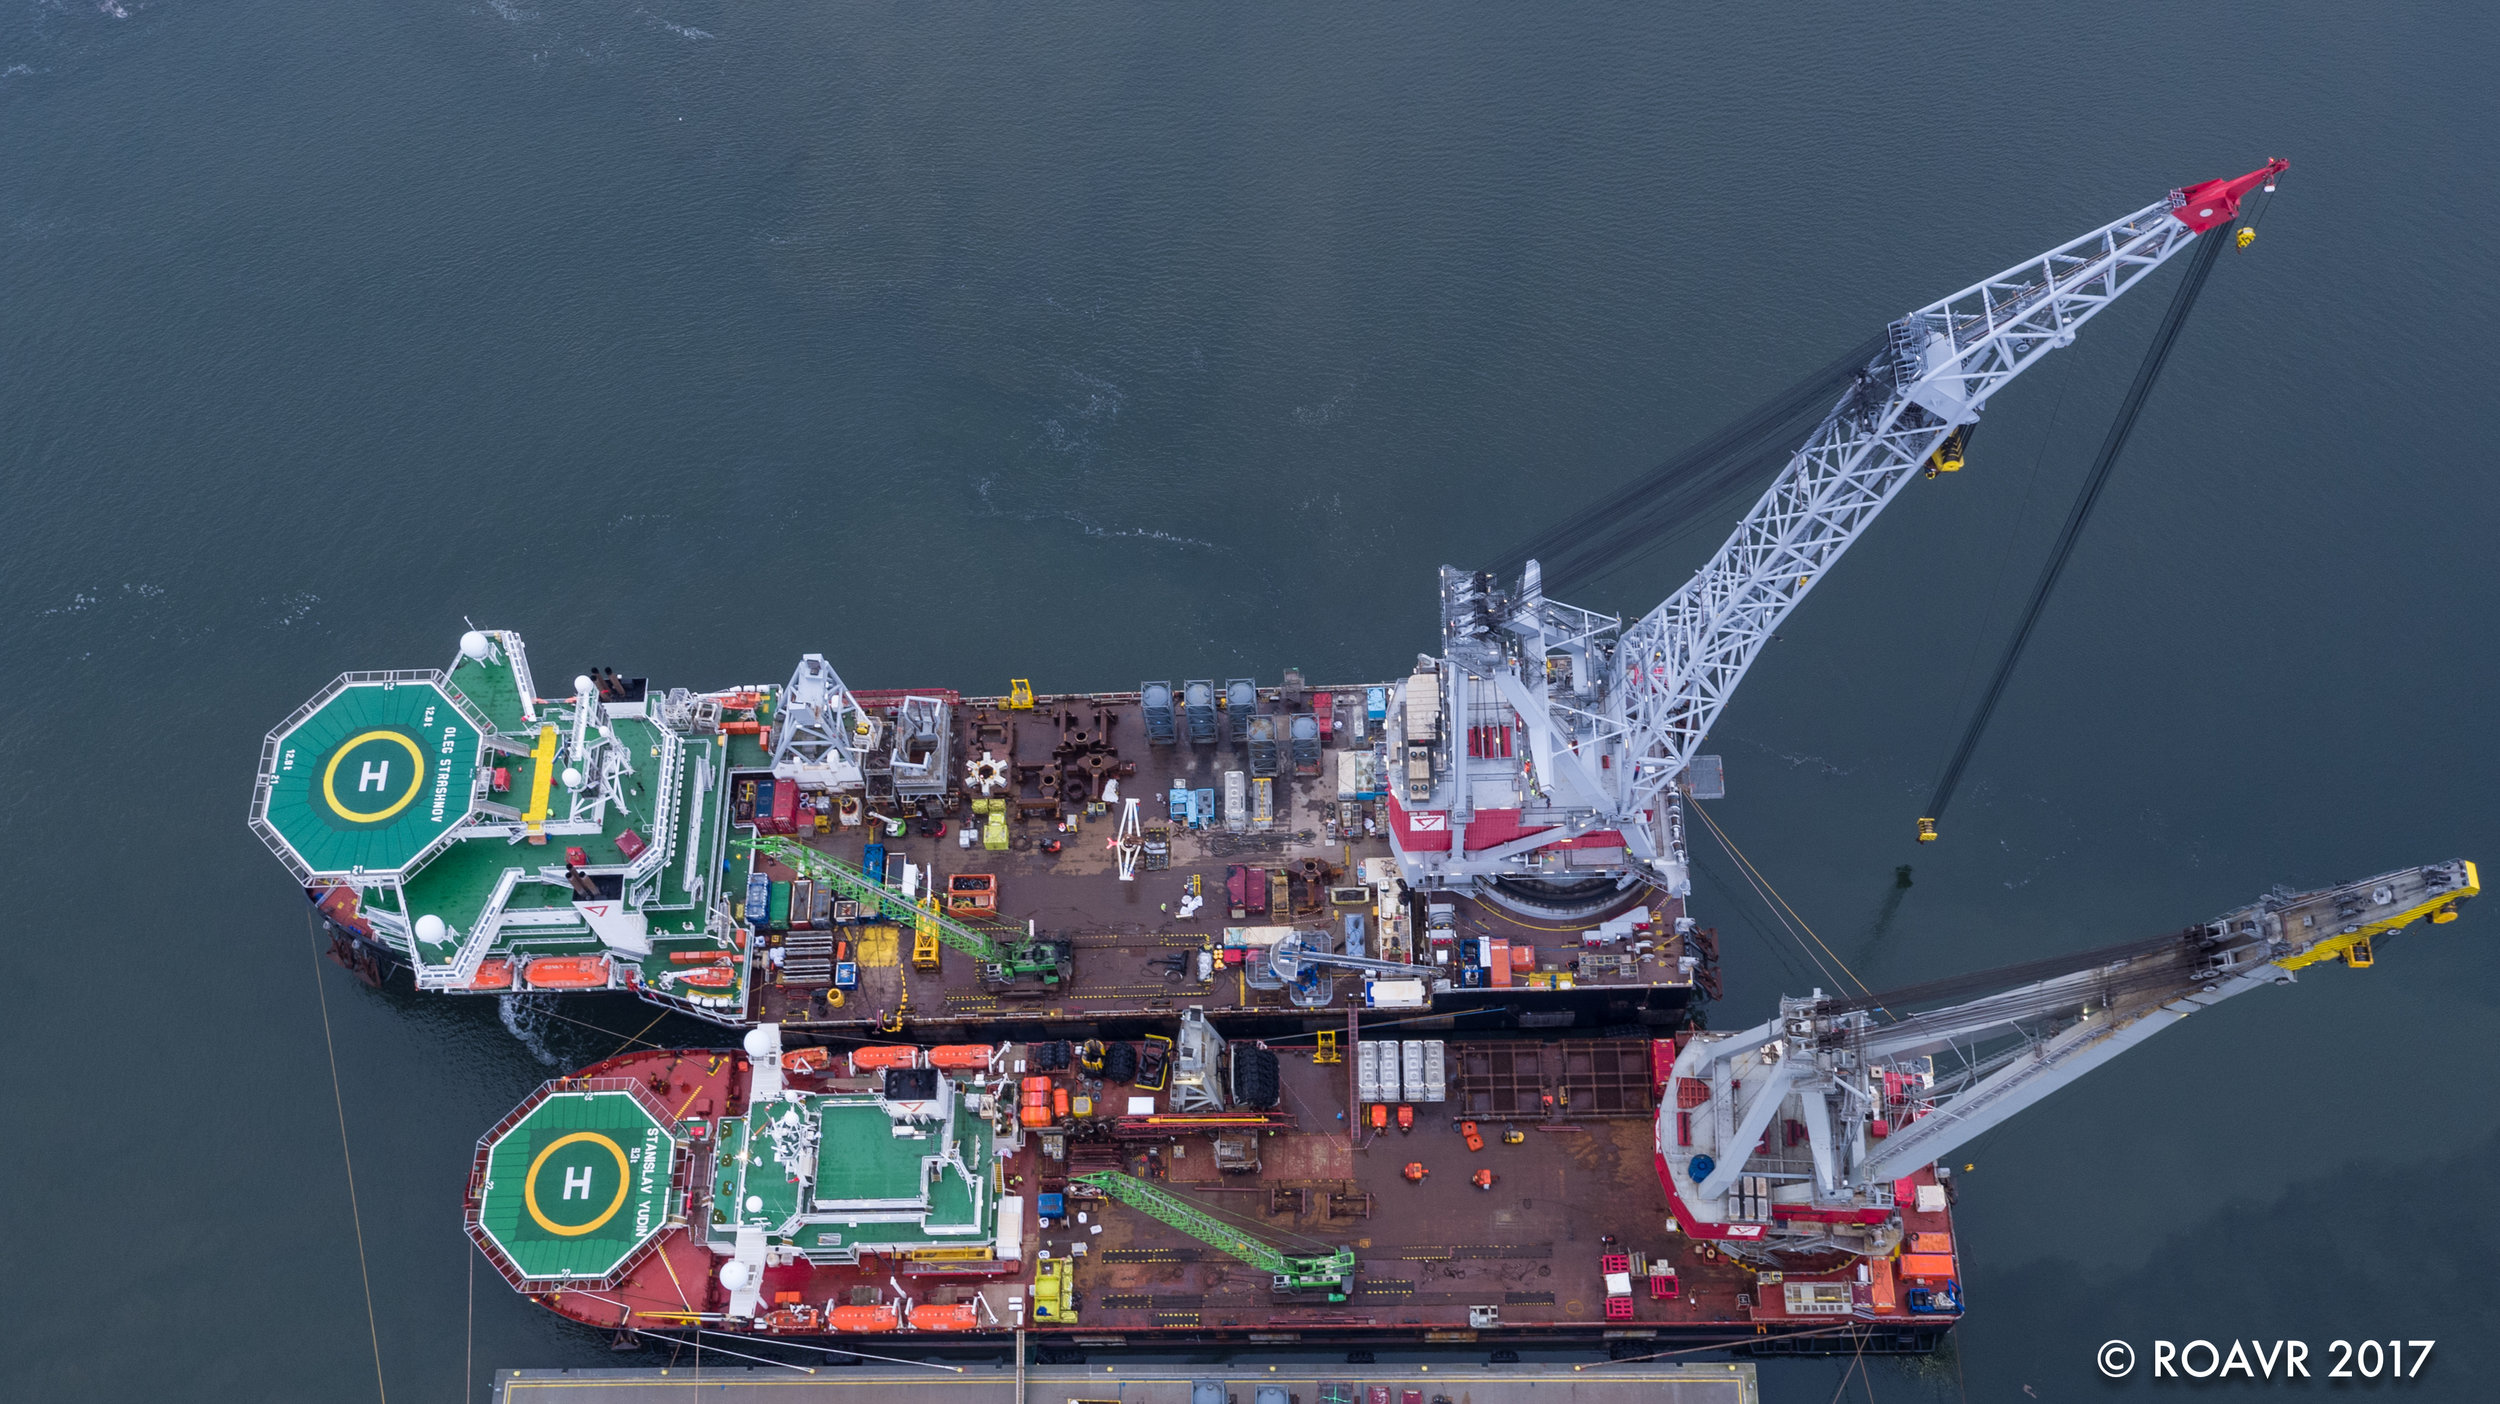 Crane ships Oleg Strashnov and Stanislav Yudin